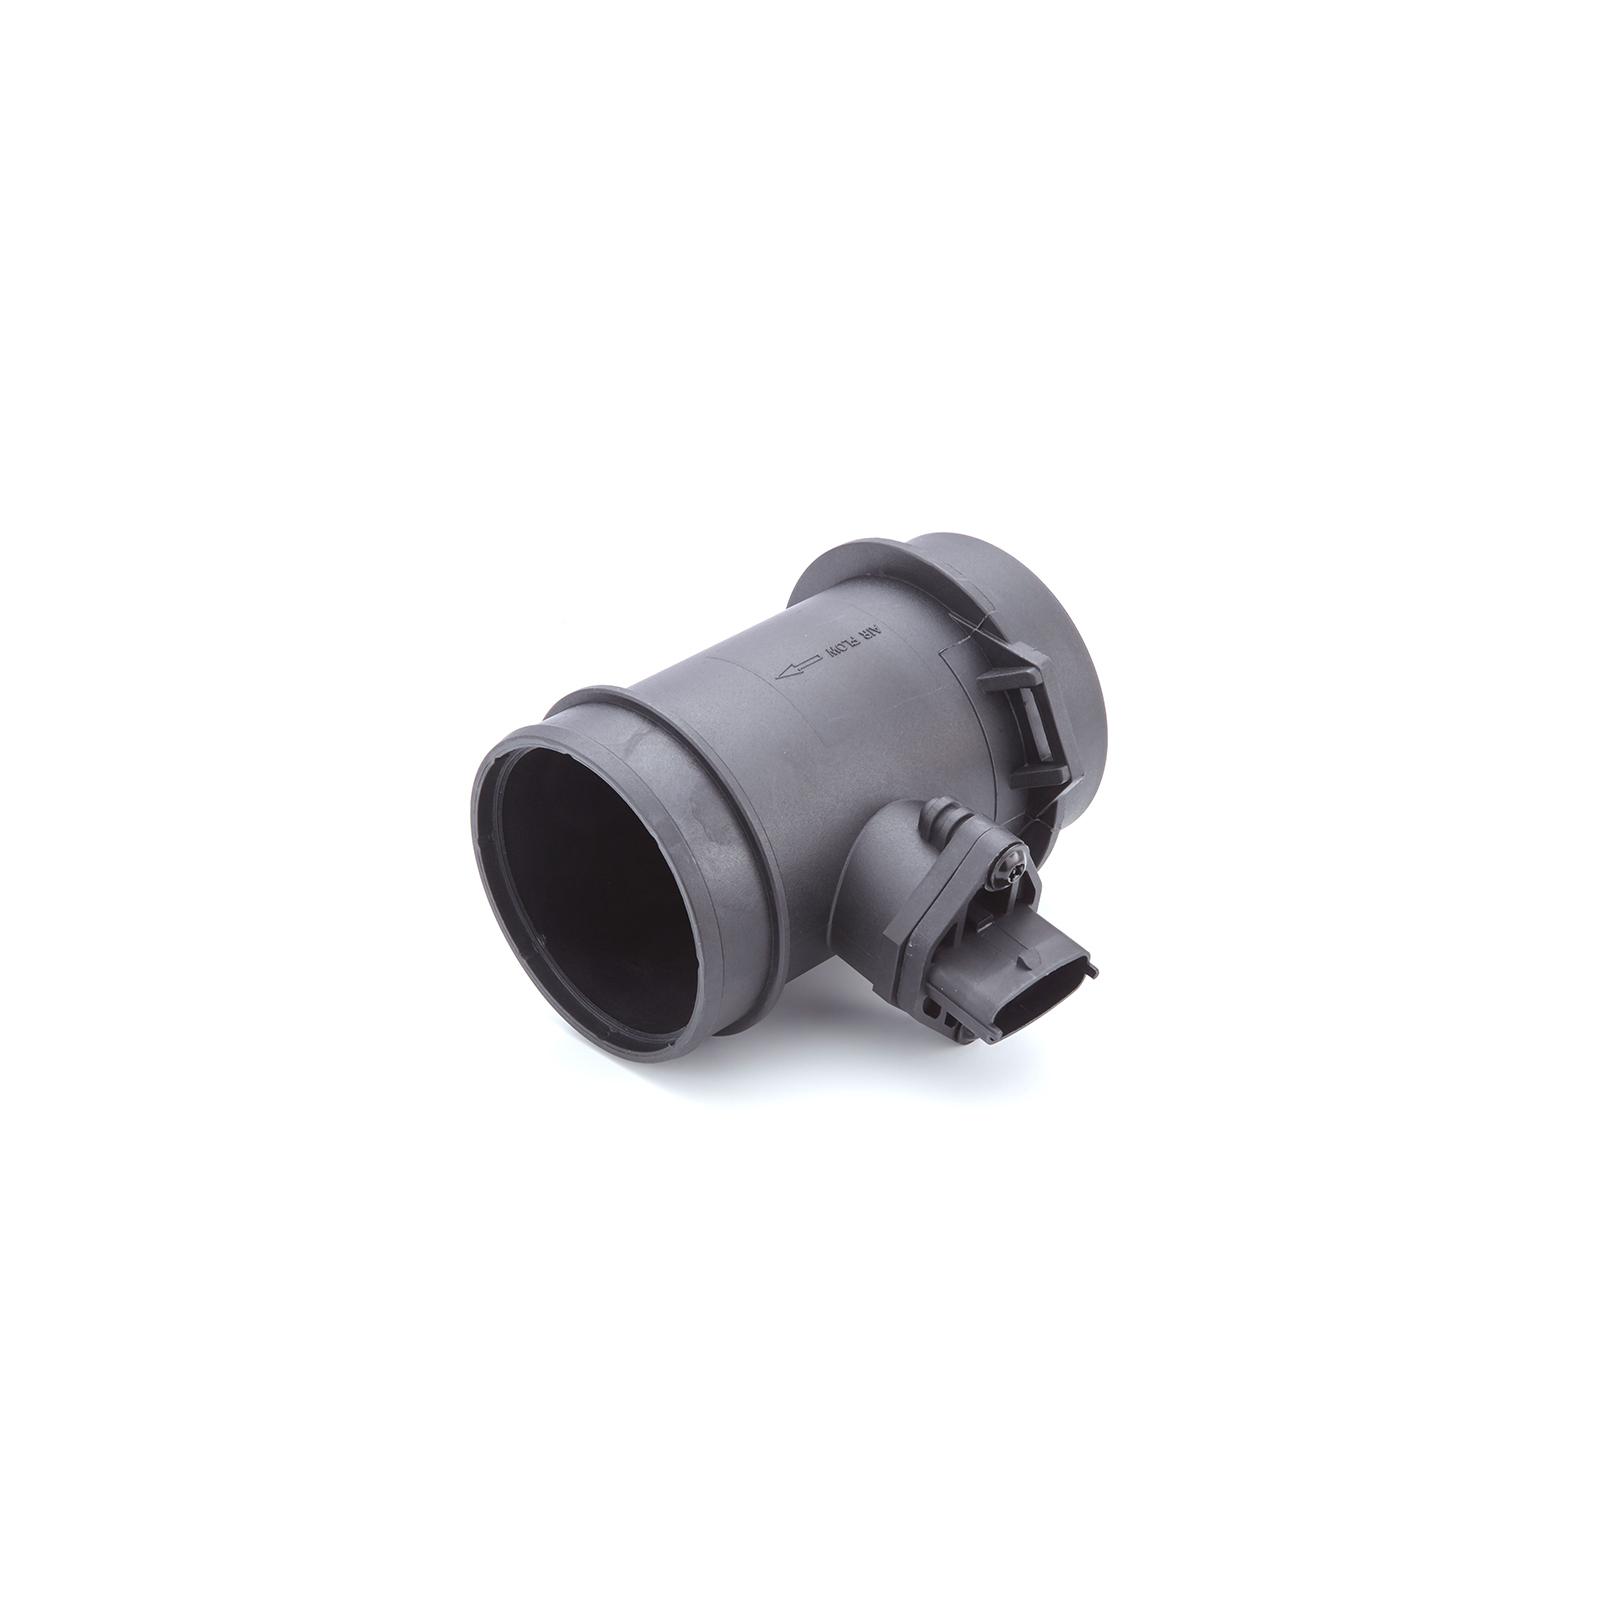 Mass-Air-Flow-Meter-Sensor-For-Honda-MG-Rover-Ferrari Indexbild 8